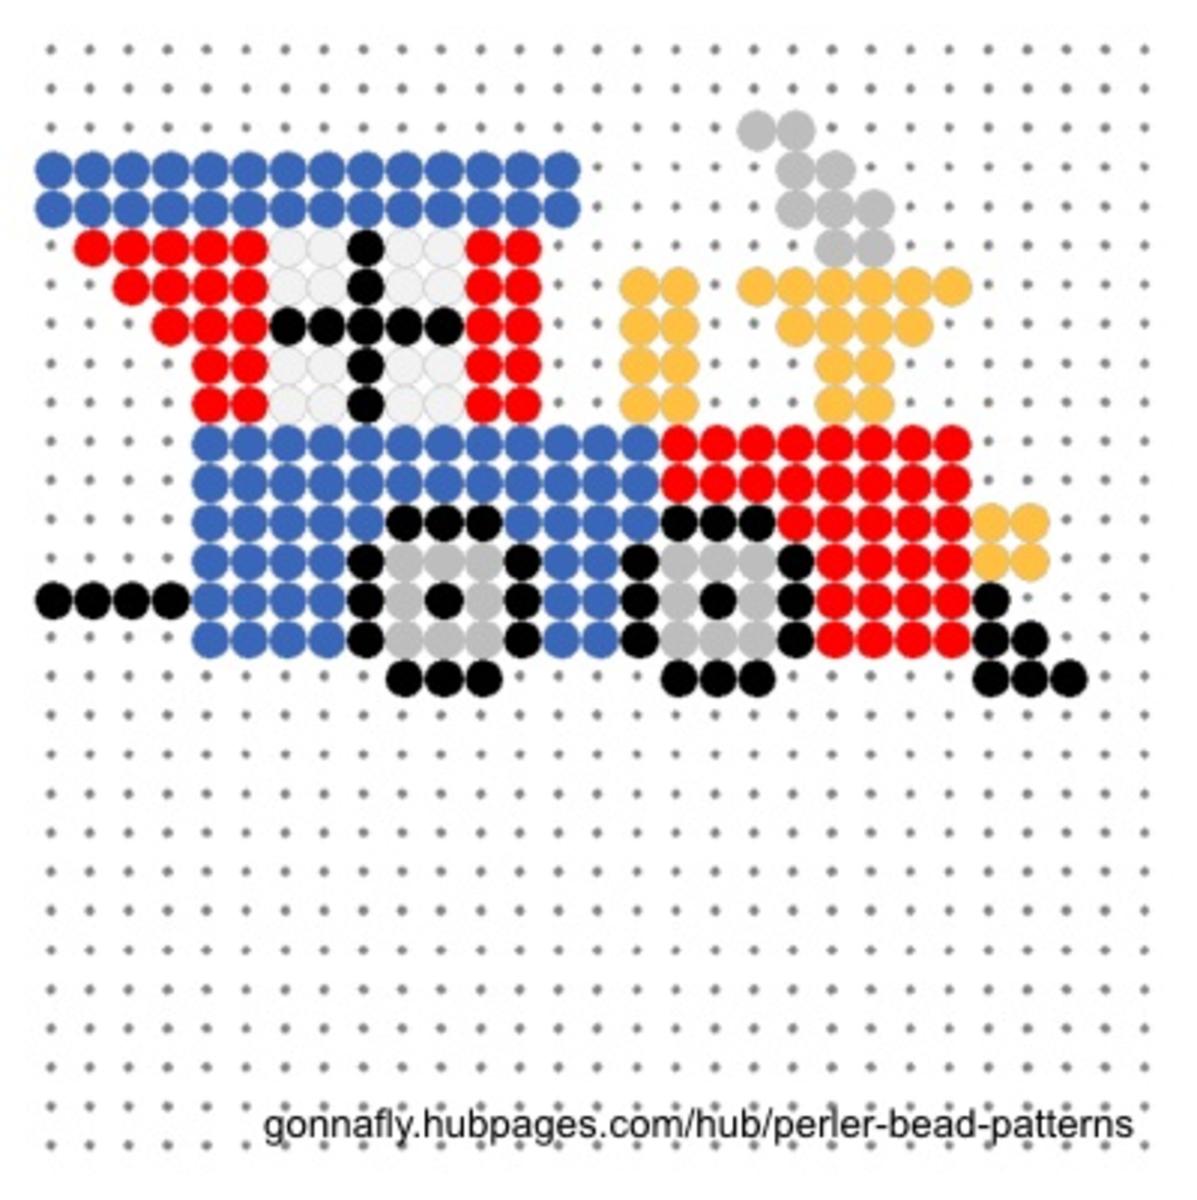 Train engine fuse bead pattern